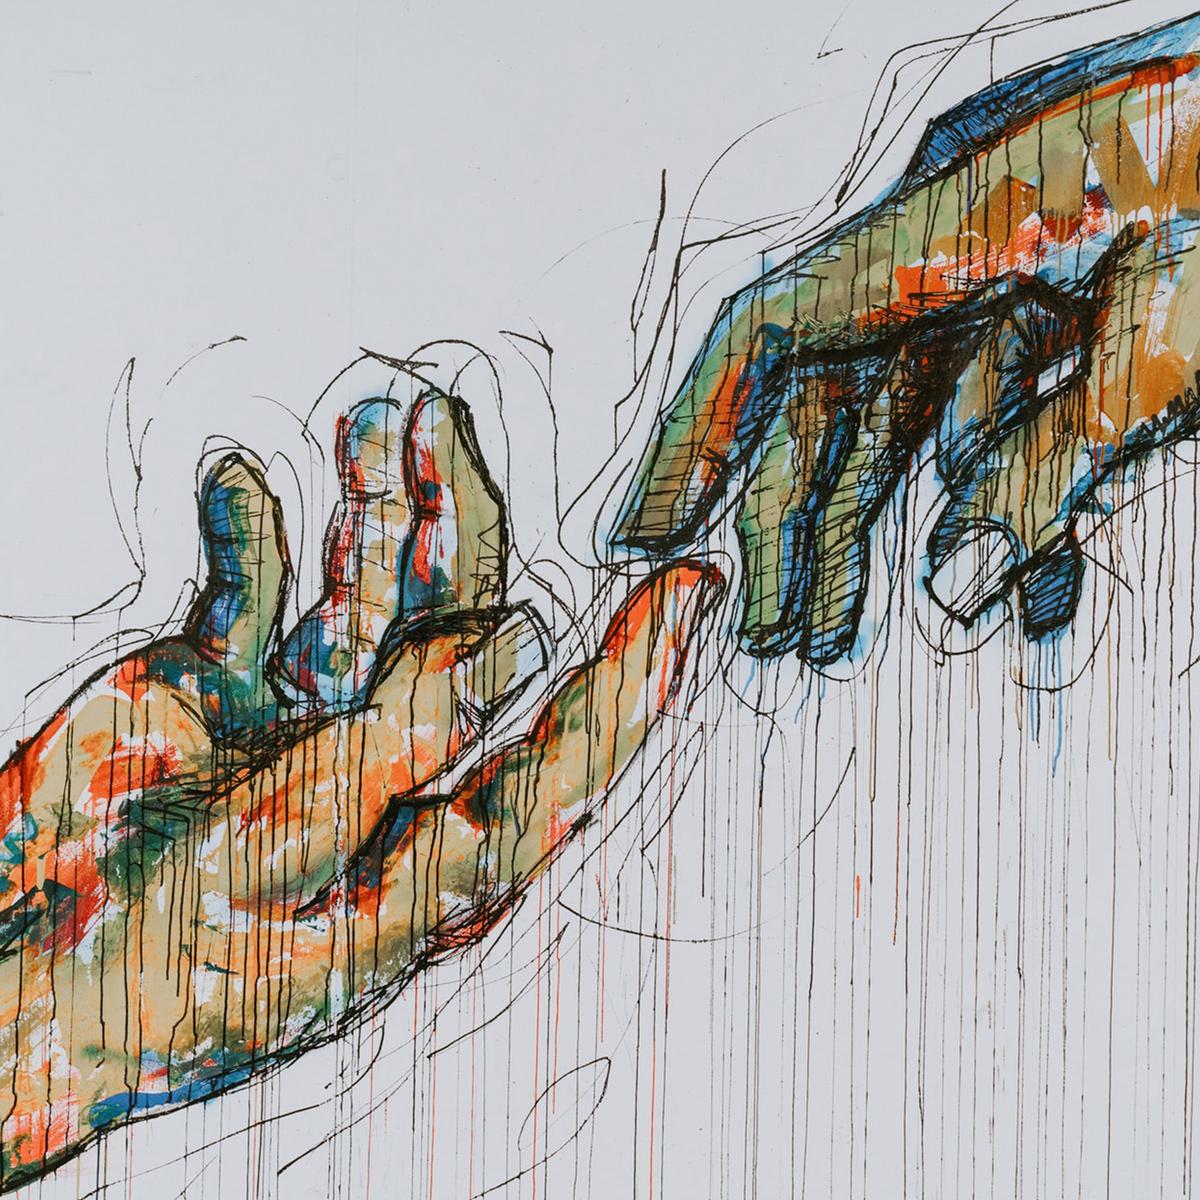 Hands reaching toward eachother